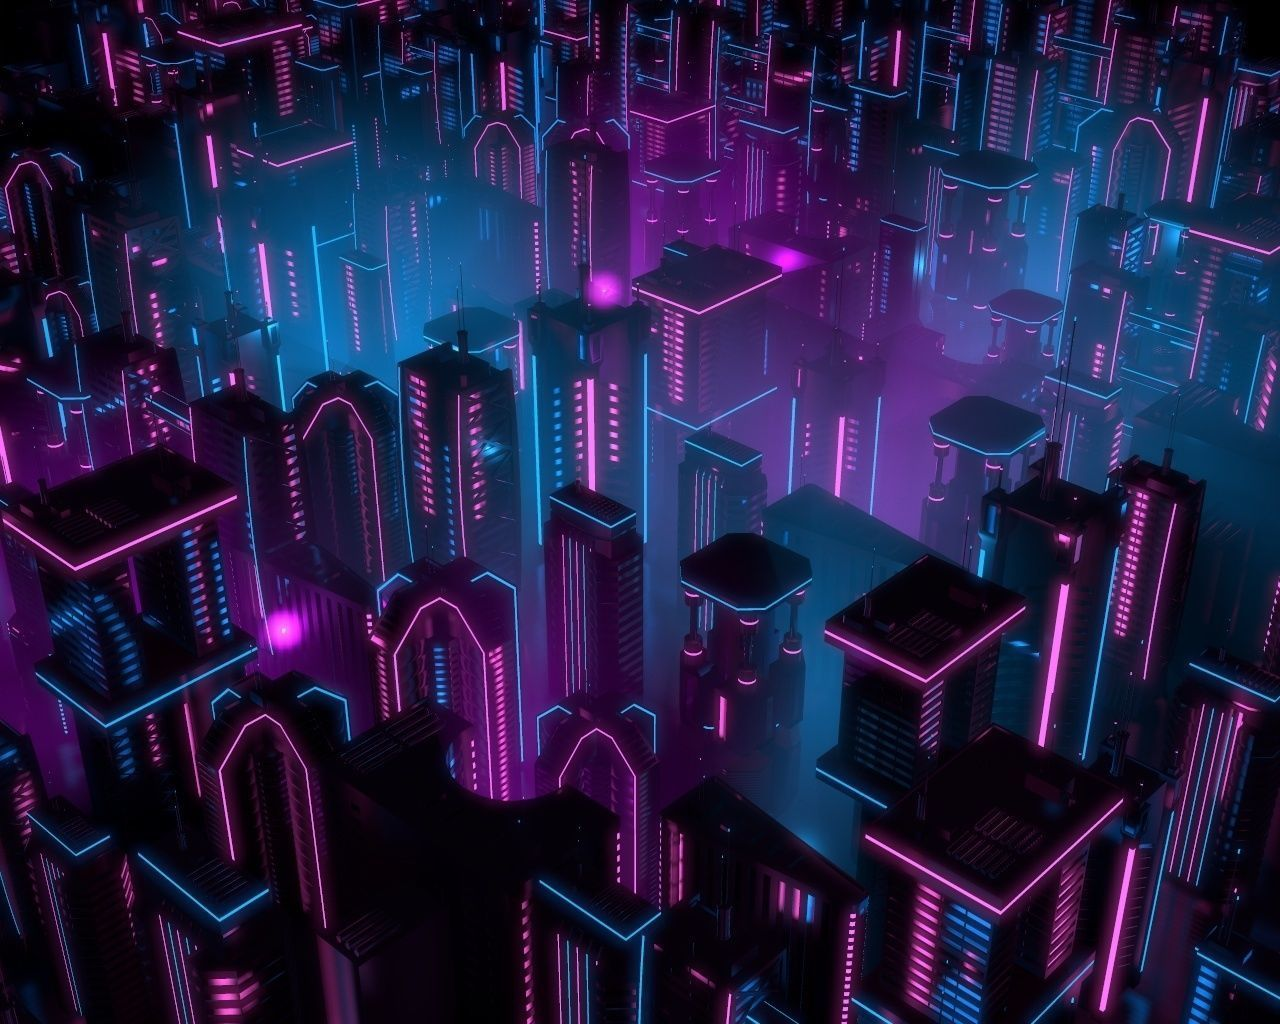 Neon Buildings